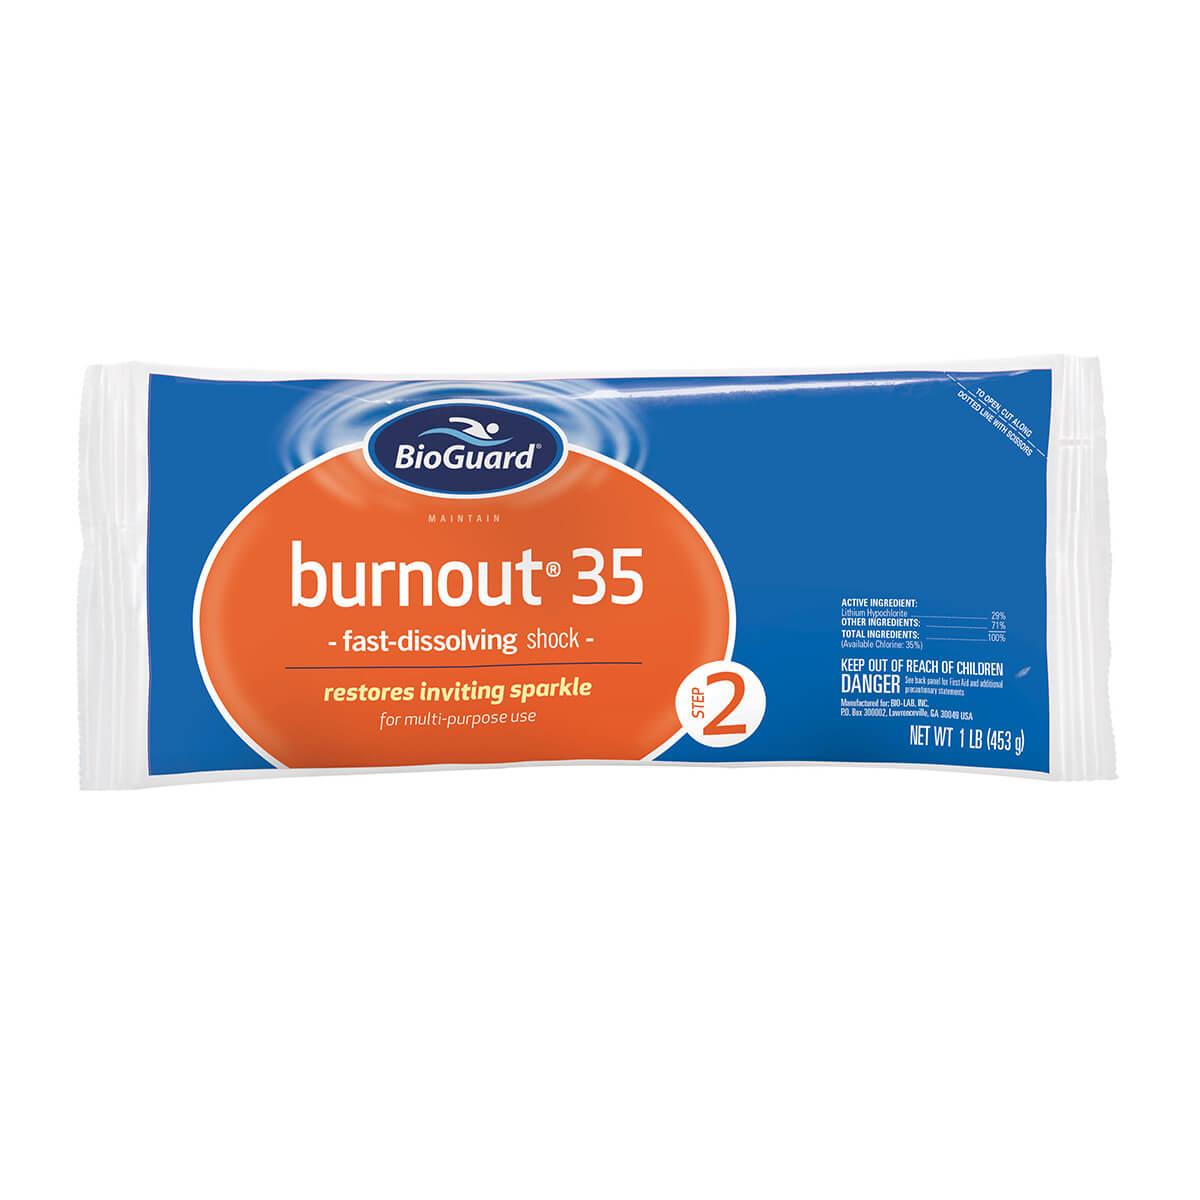 BioGuard Burnout 35